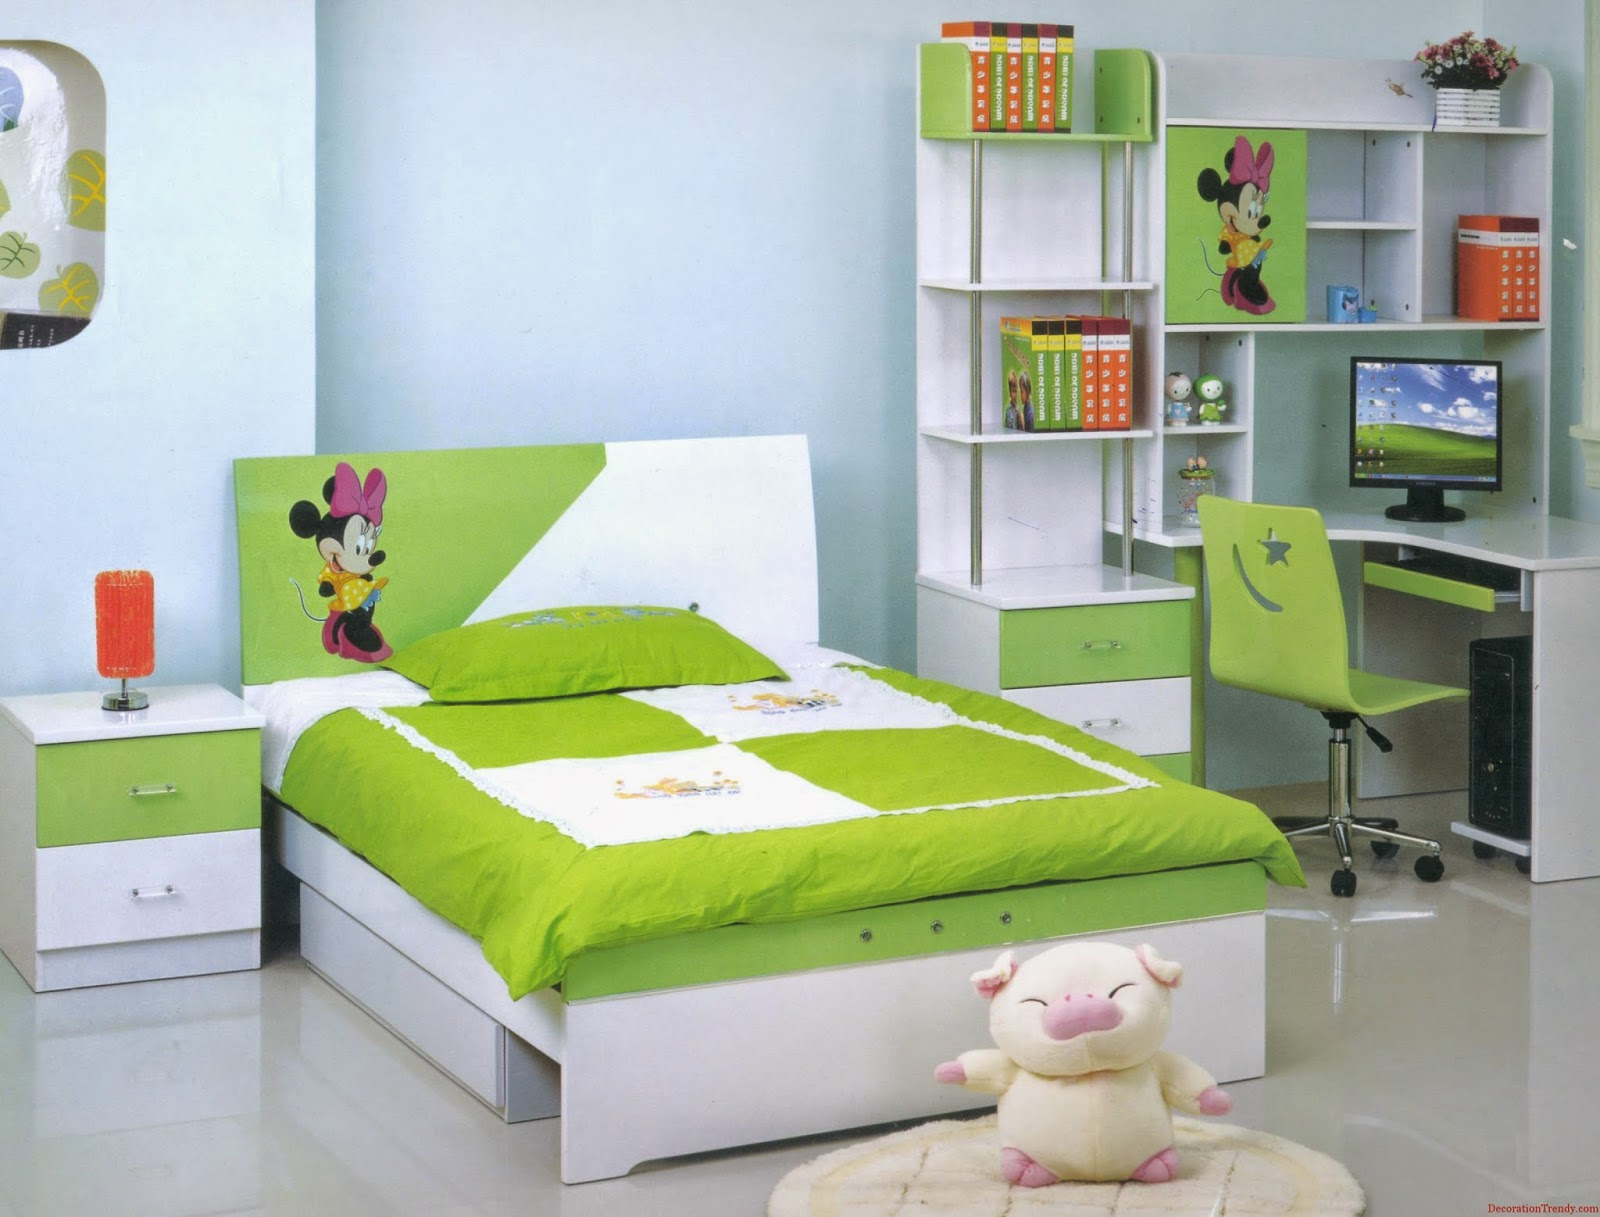 dapur minimalis sederhana warna hijau